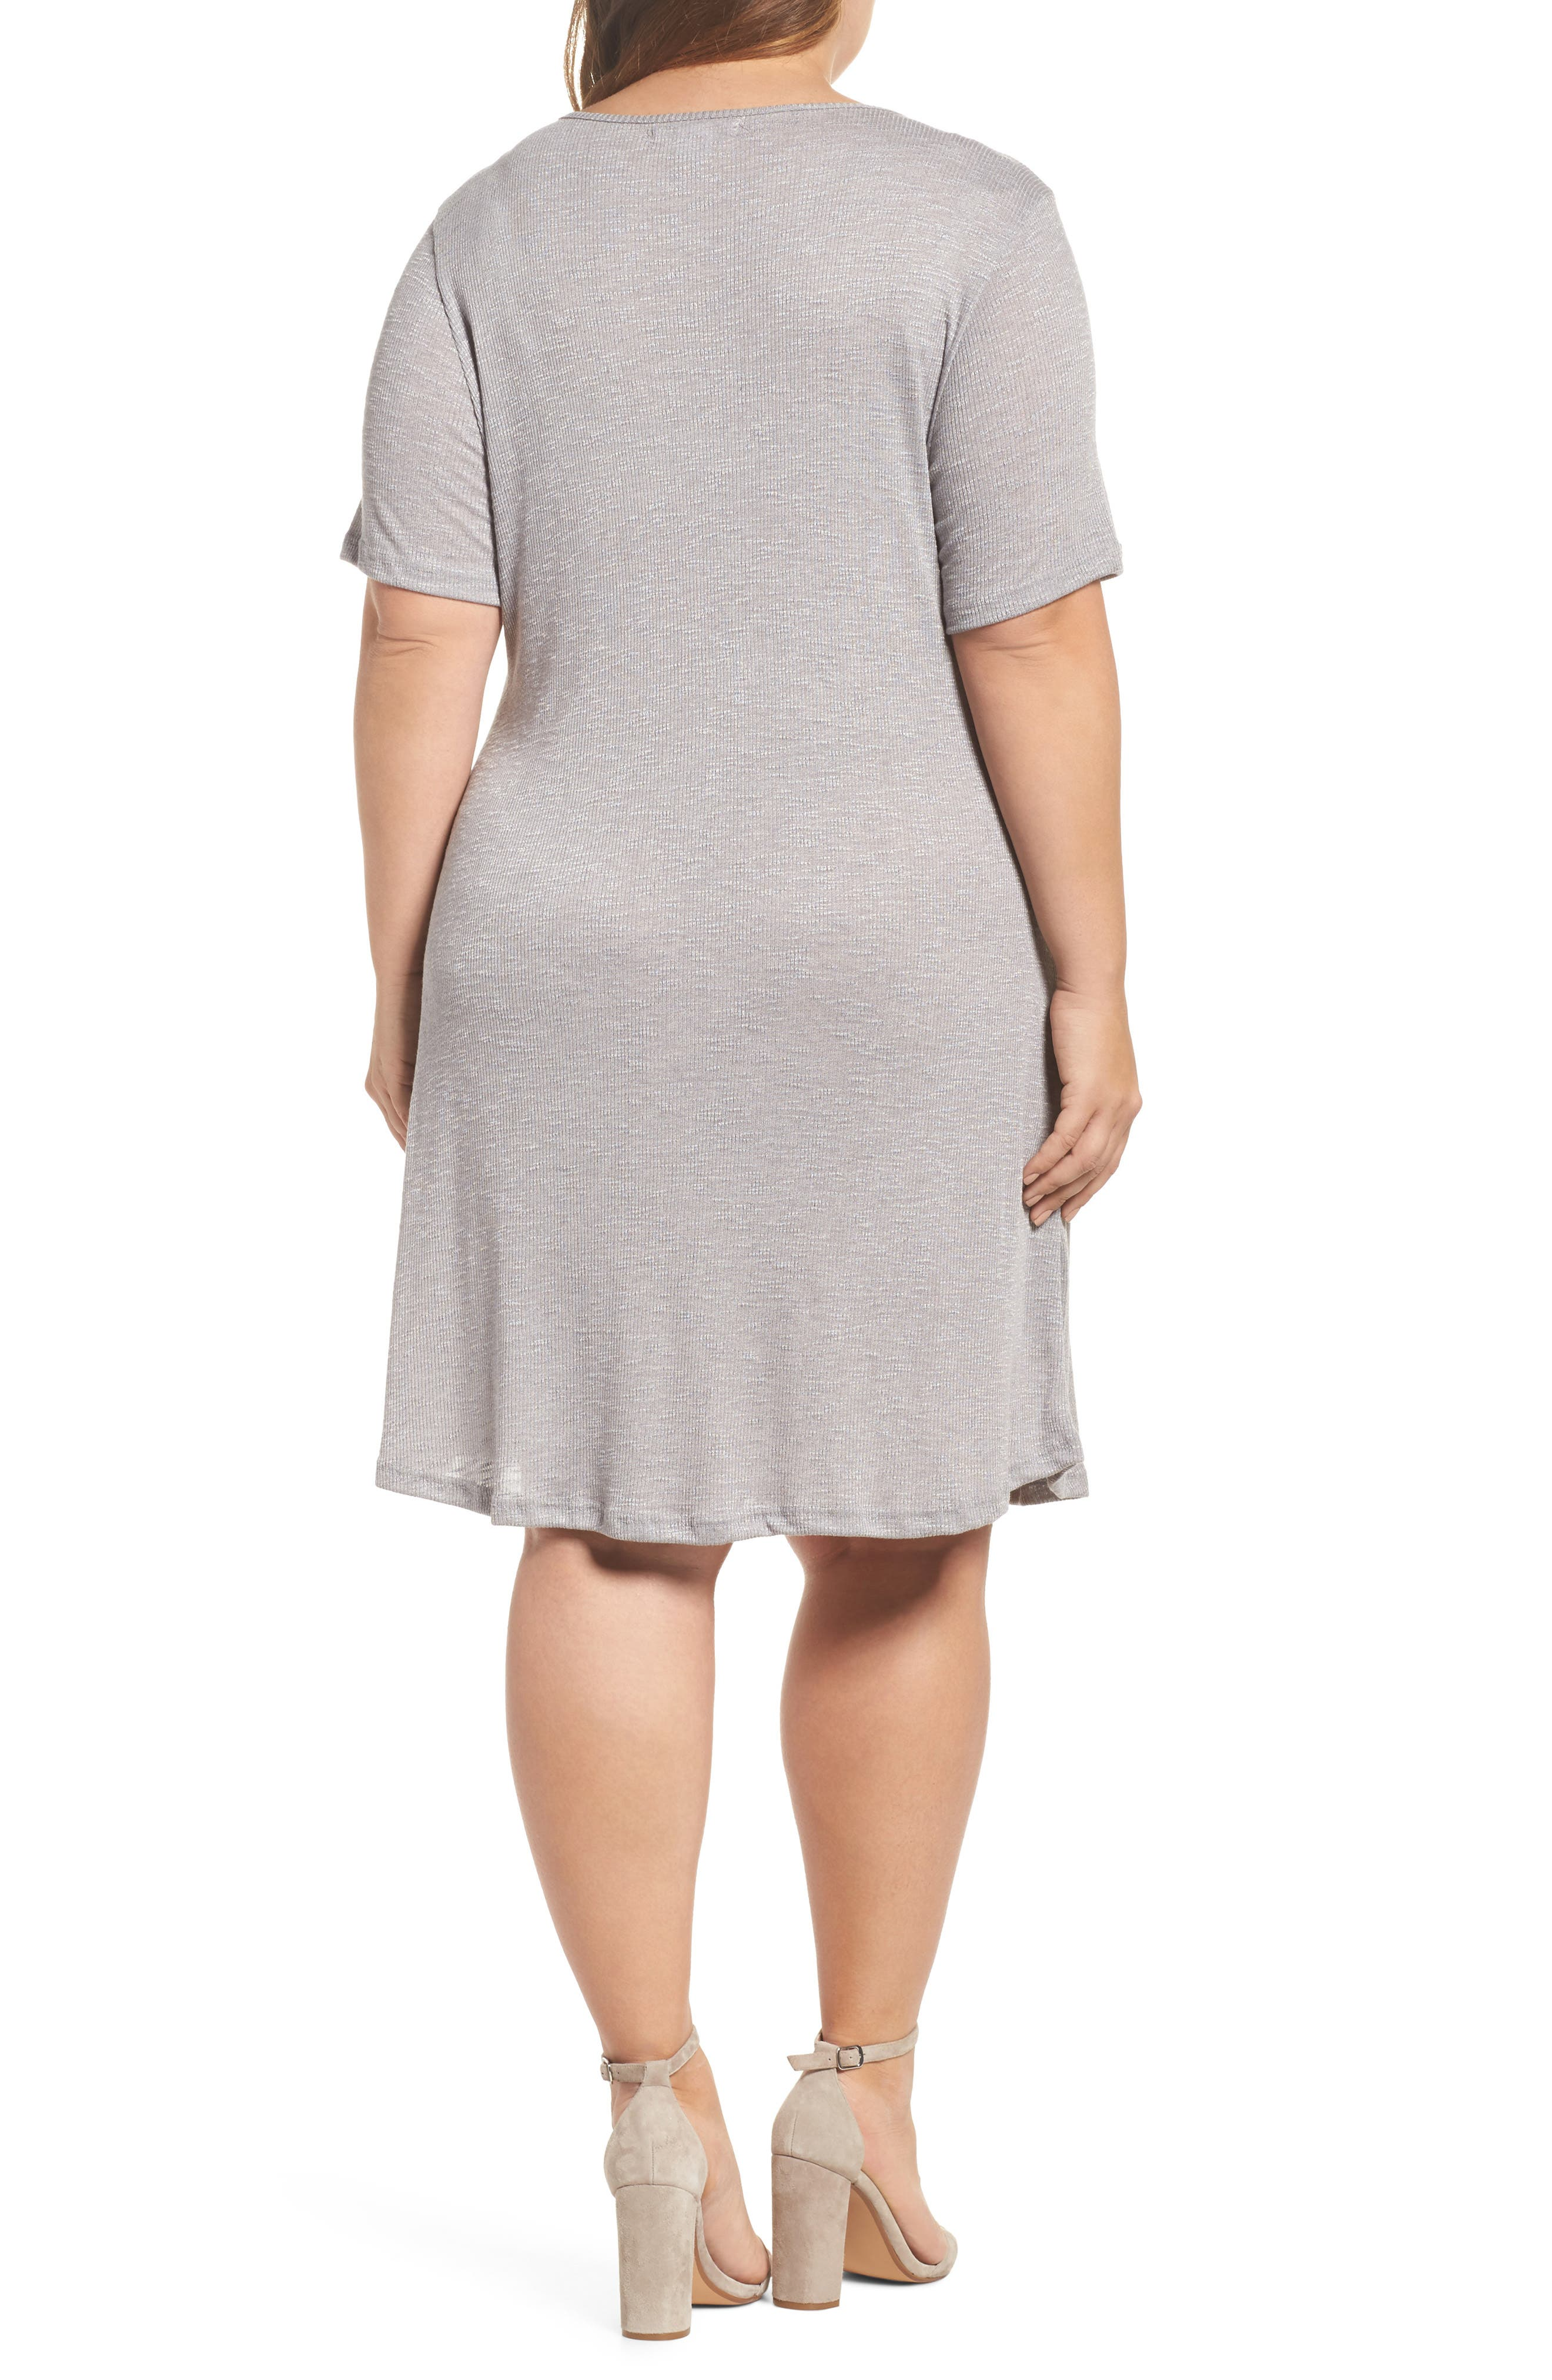 Lace-Up Knit Shift Dress,                             Alternate thumbnail 2, color,                             Grey